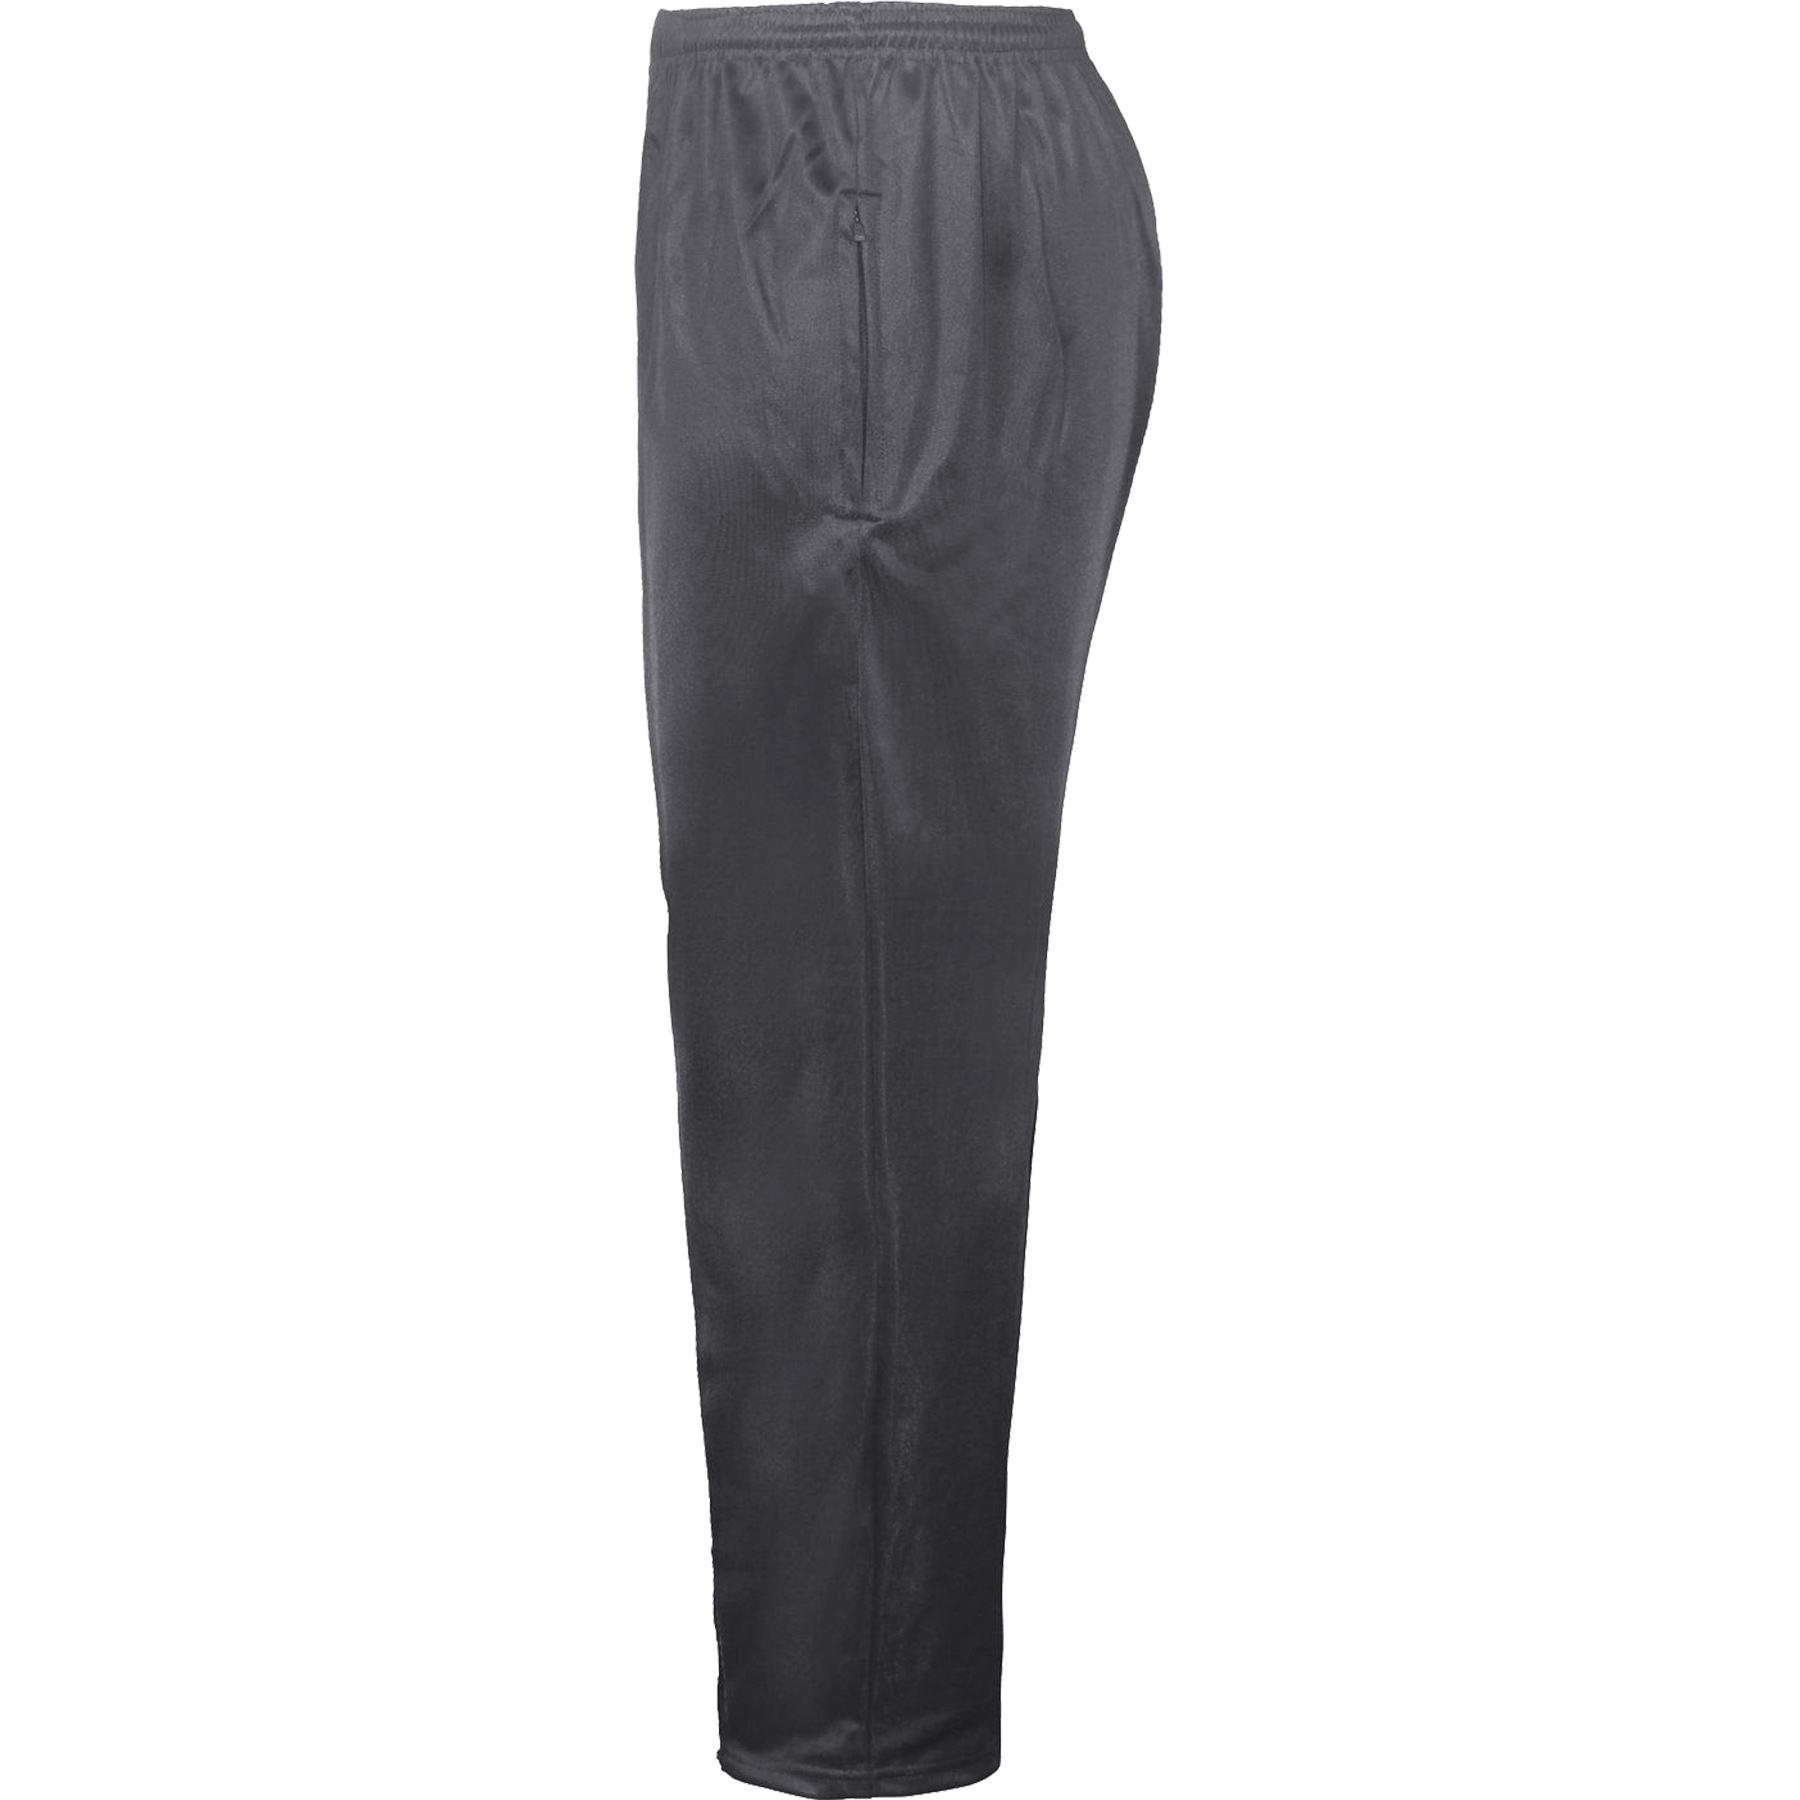 Da Uomo Tinta Unita Seta Tasche Con Cerniera Pantaloni da jogging Pantaloni sportivi da palestra Sport Yoga Bottoms